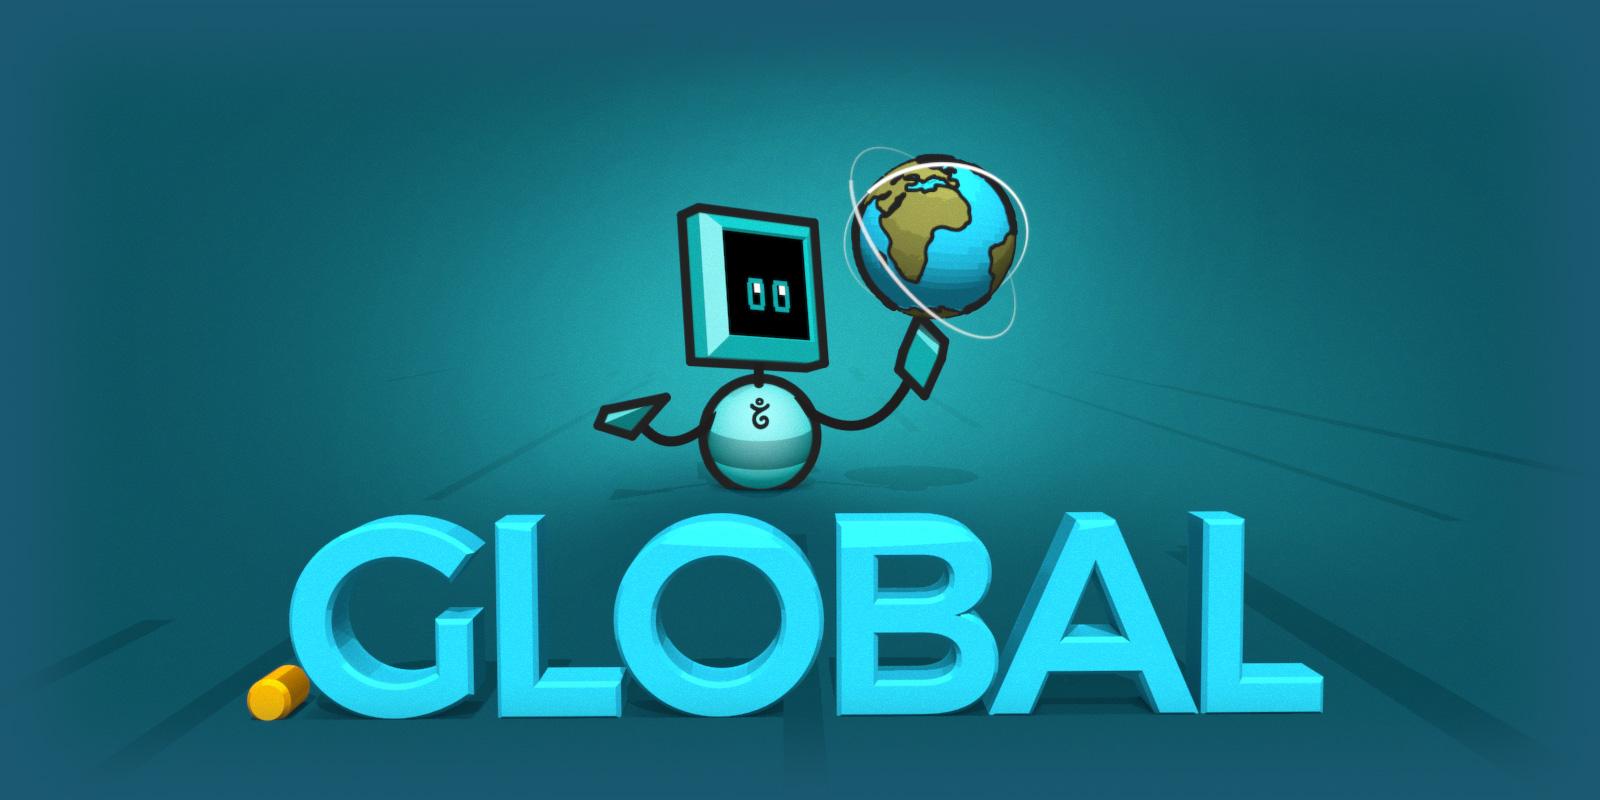 A .global domain name promo